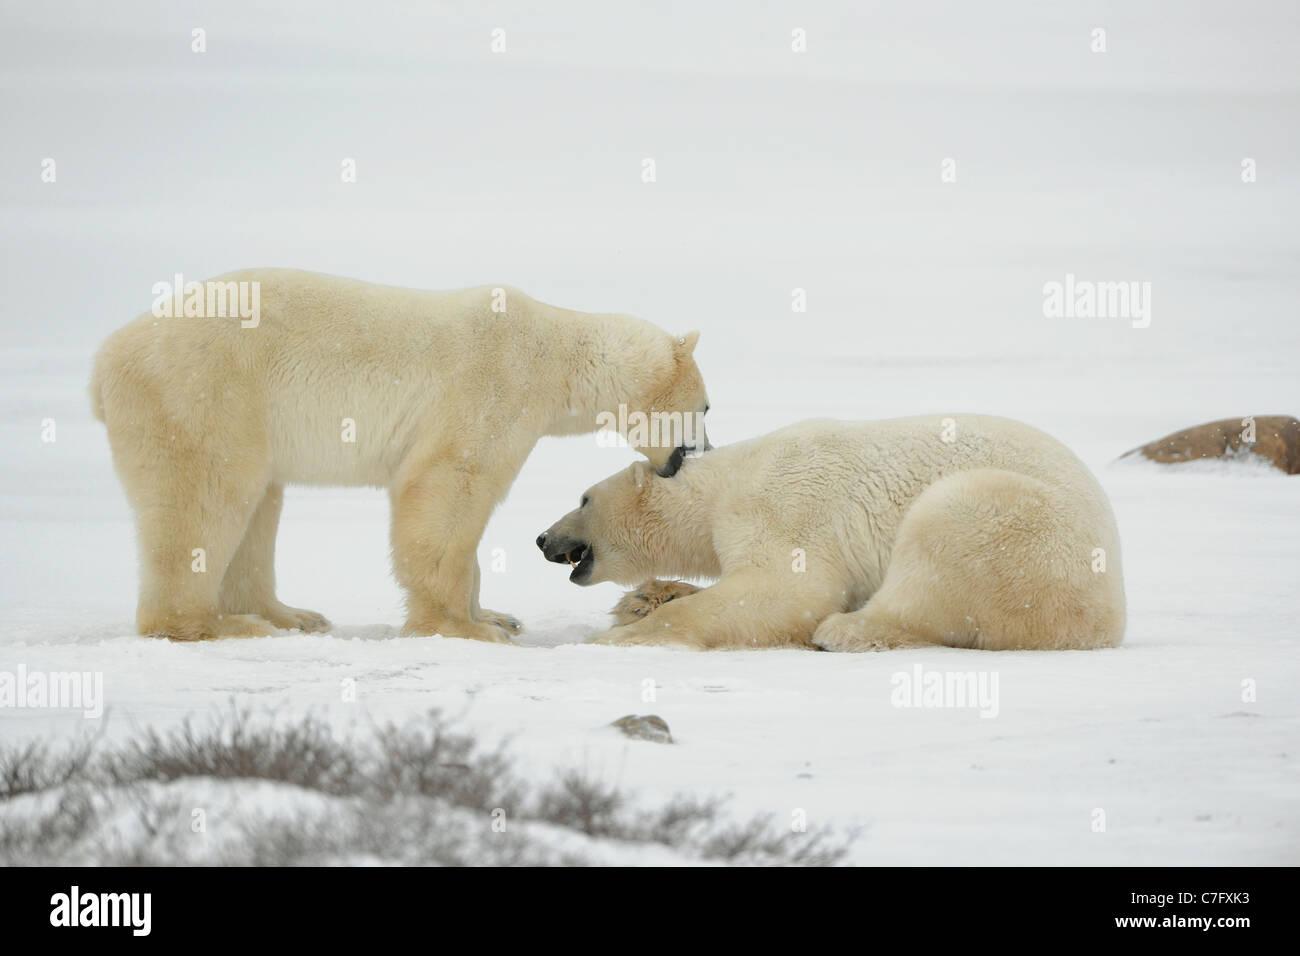 Entertainments of polar bears. Two polar bears struggle on snow. - Stock Image